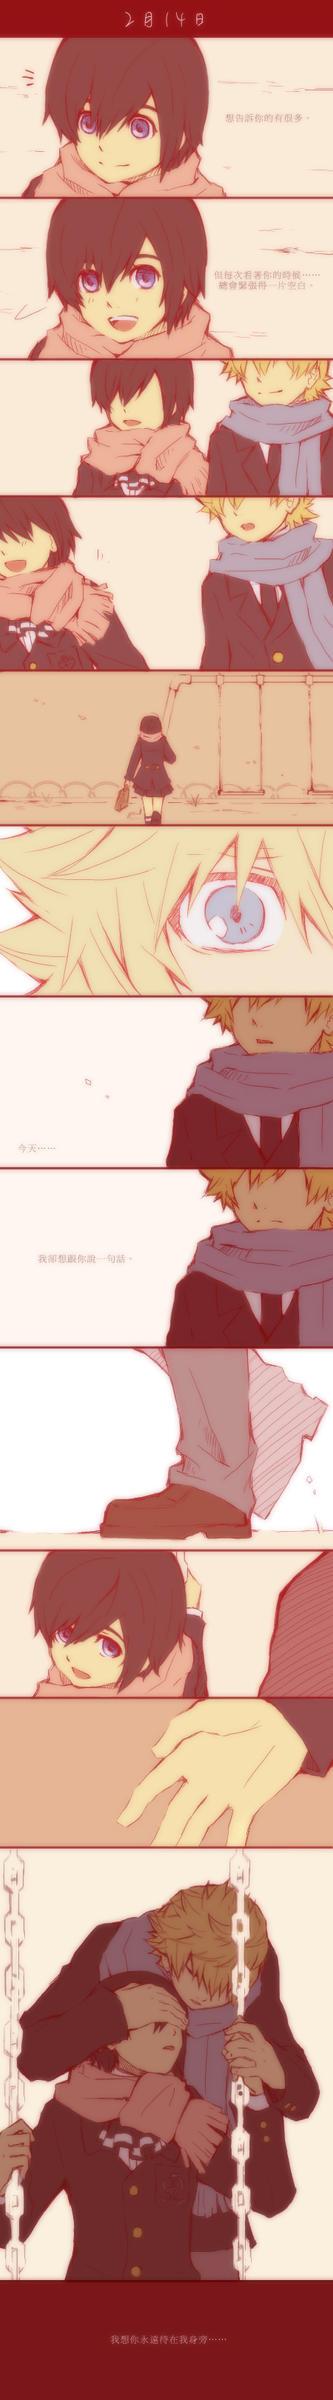 KHS: 14th February by semokan